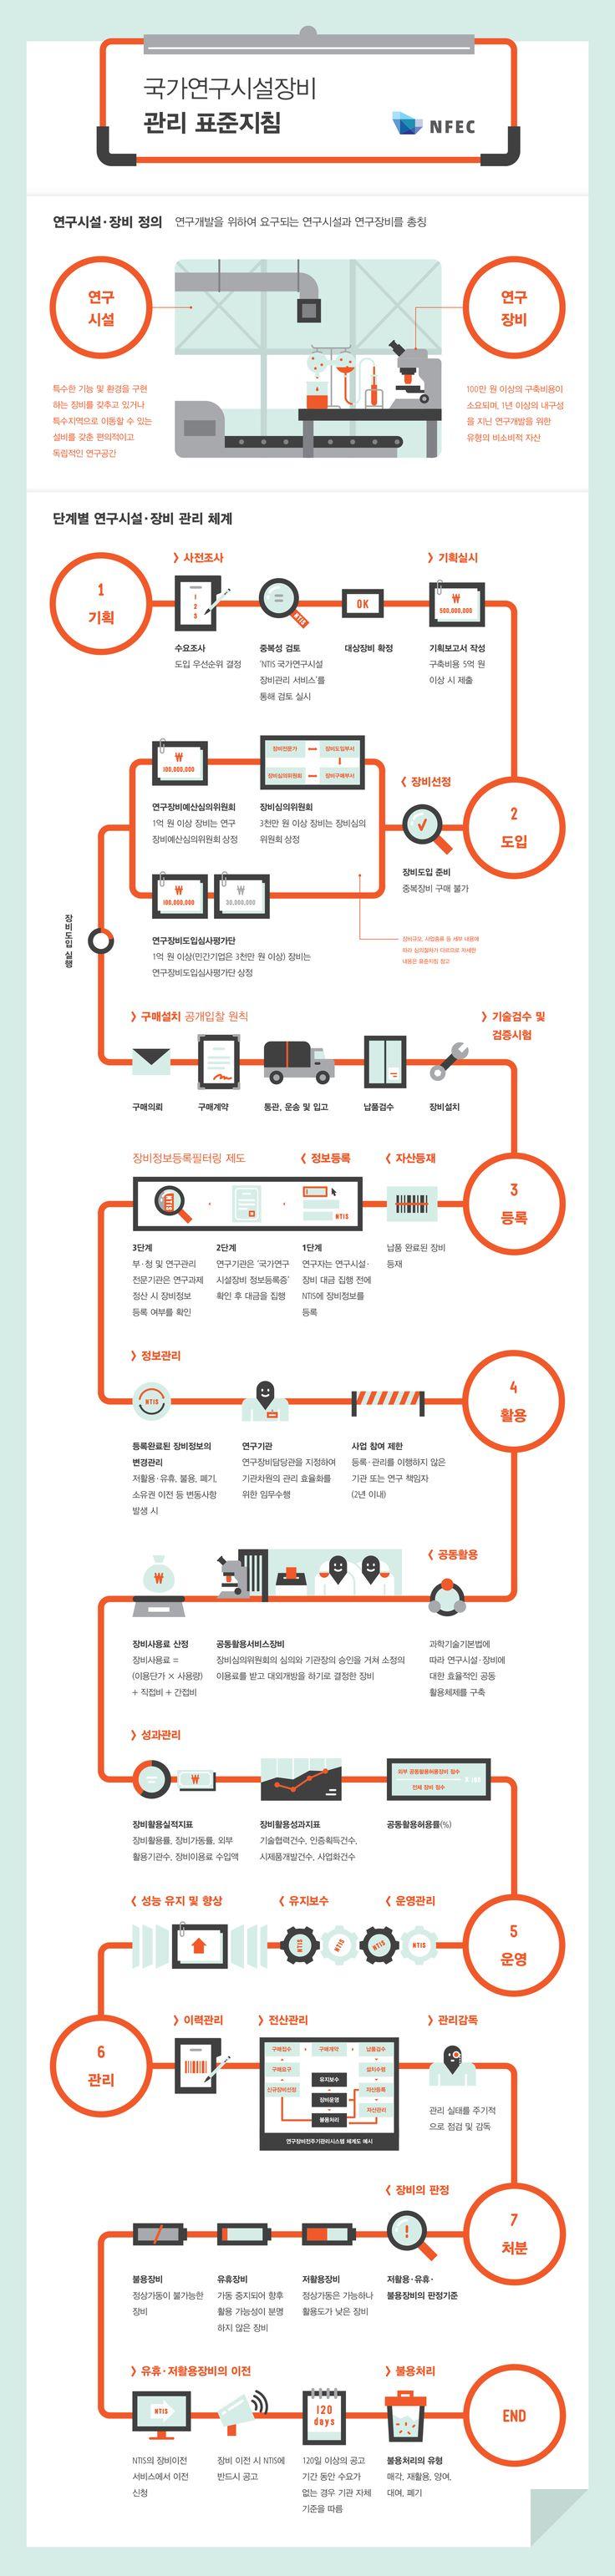 [infographic]'NFEC 관리 표준지침'에 대한 인포그래픽